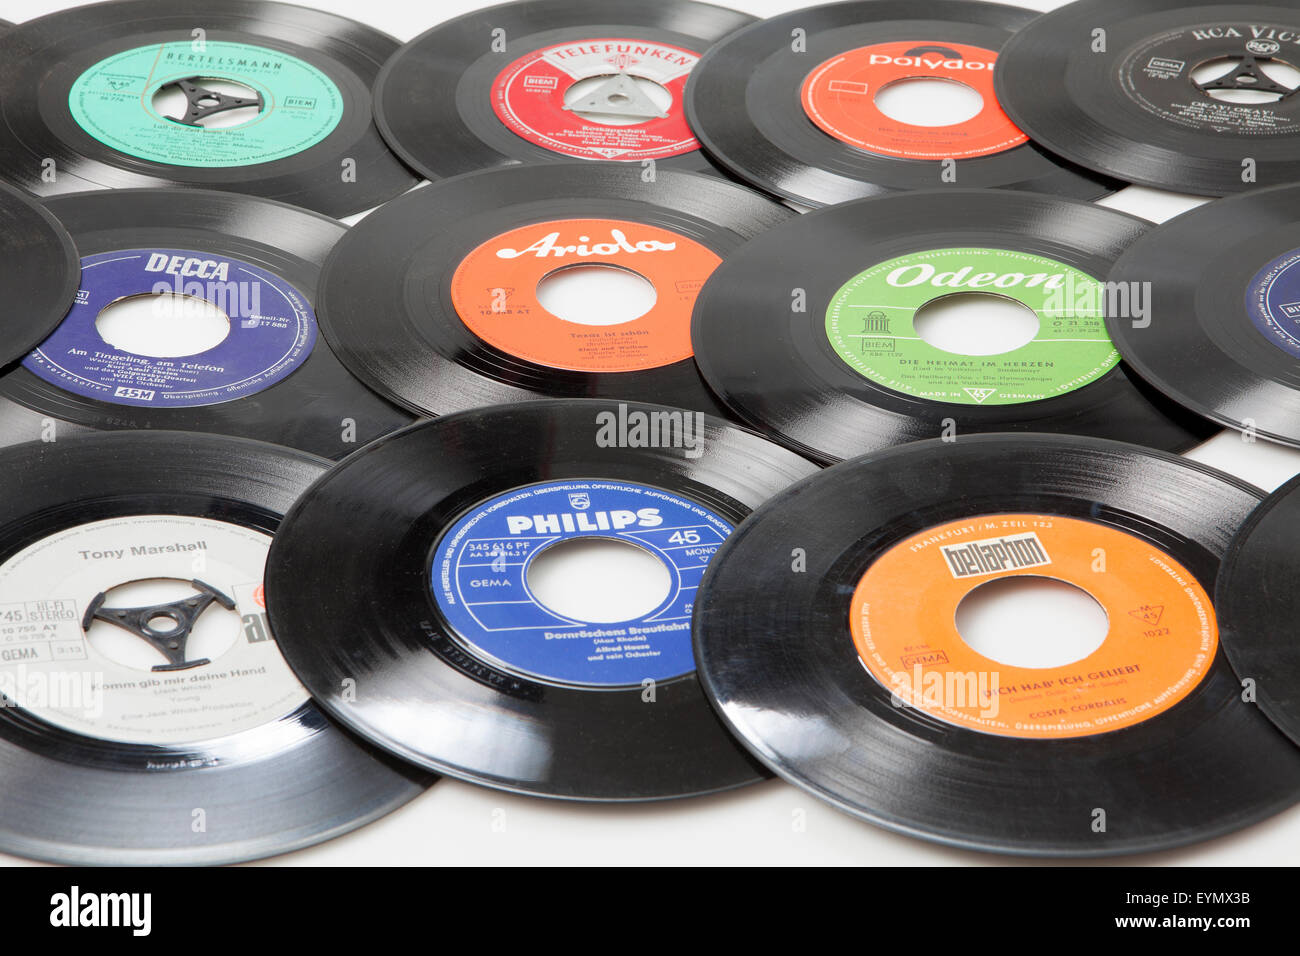 Old vinyl singles - Stock Image